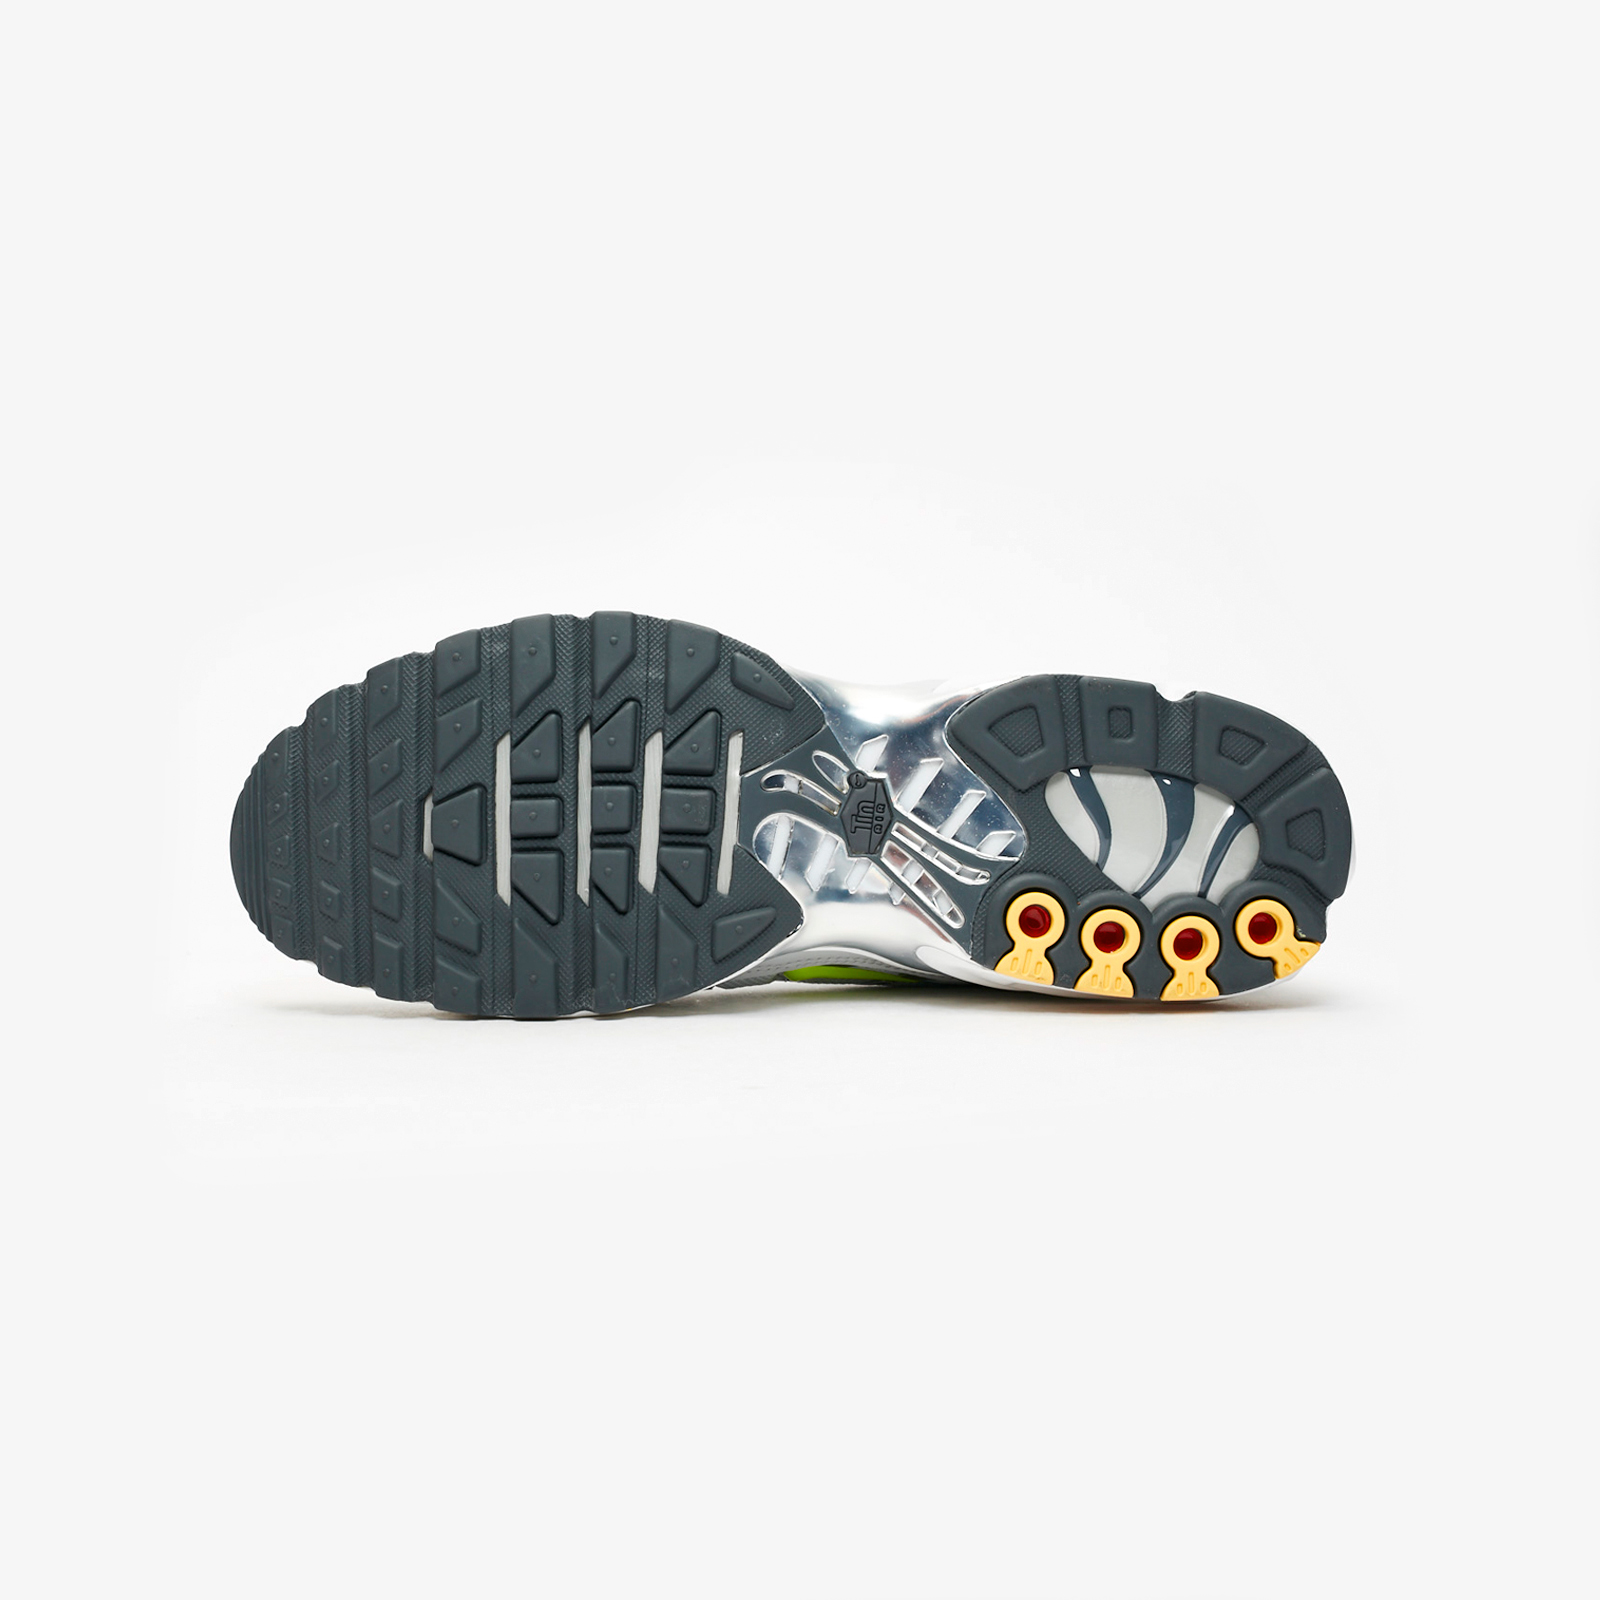 Nike Air Max Plus TN SE Cd1533 002 Sneakersnstuff